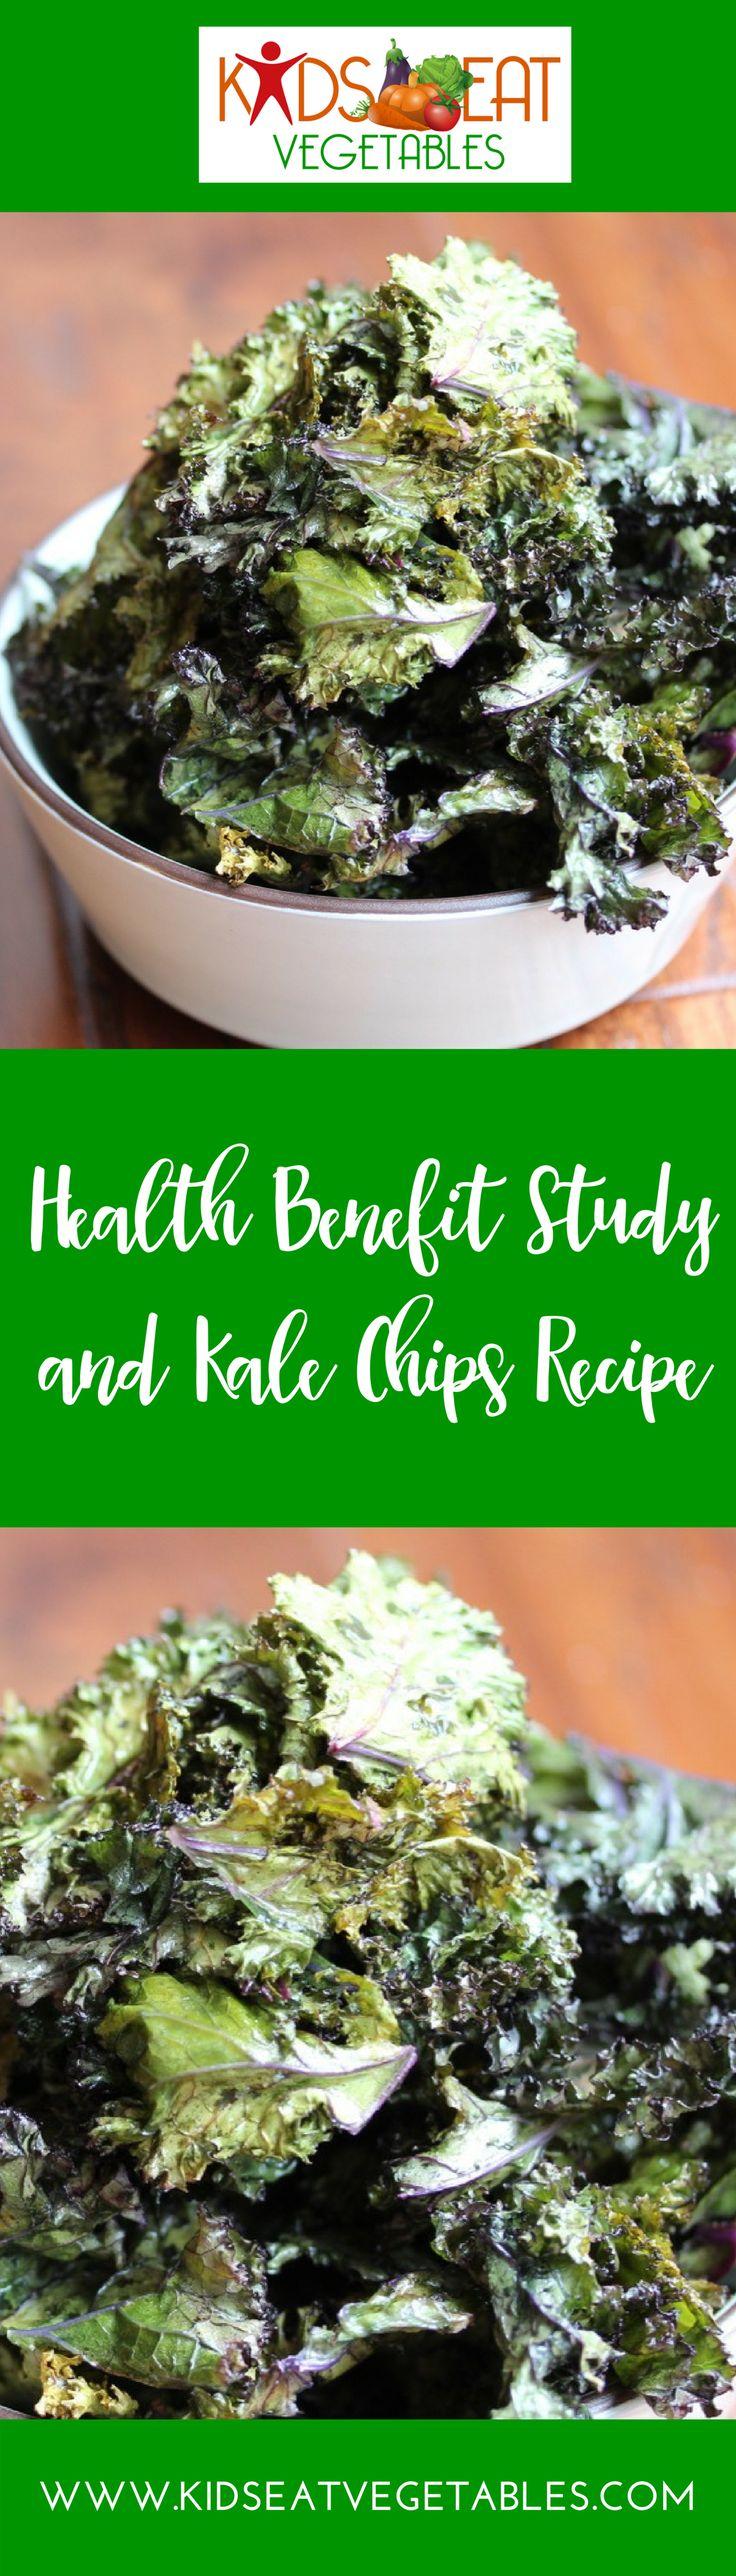 best 25 nutrients in vegetables ideas on pinterest benefits of